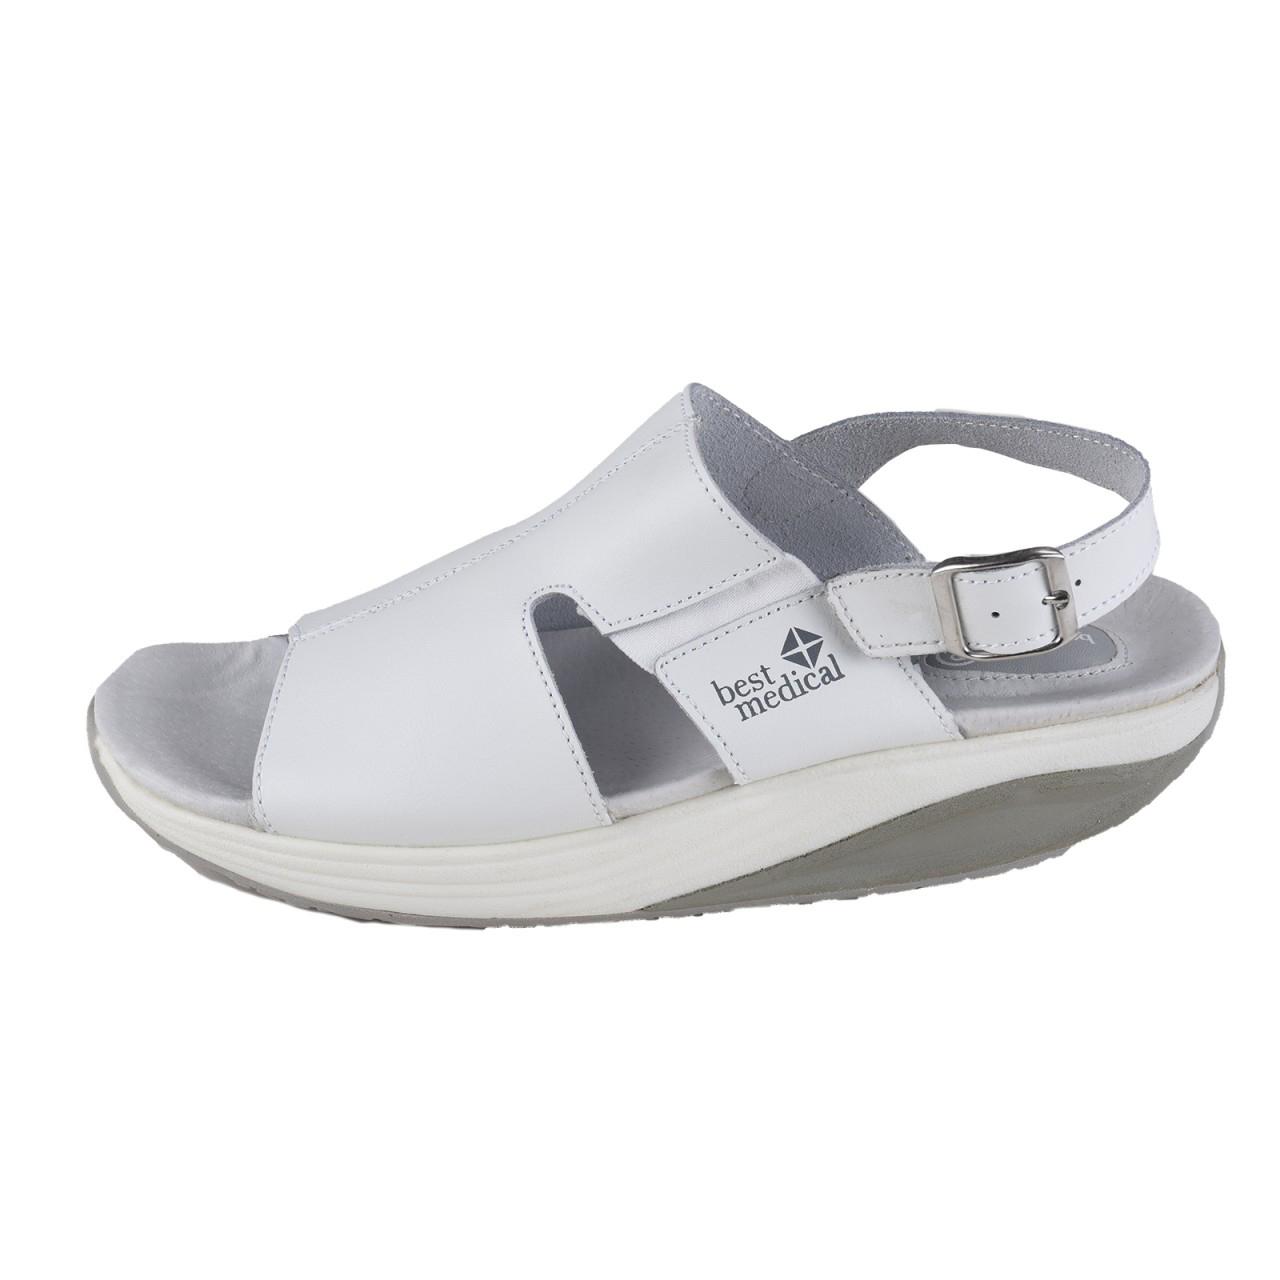 BEST MEDICAL Damen Berufsschuh Sandale, Weiß – Bild 2 c3638a6637